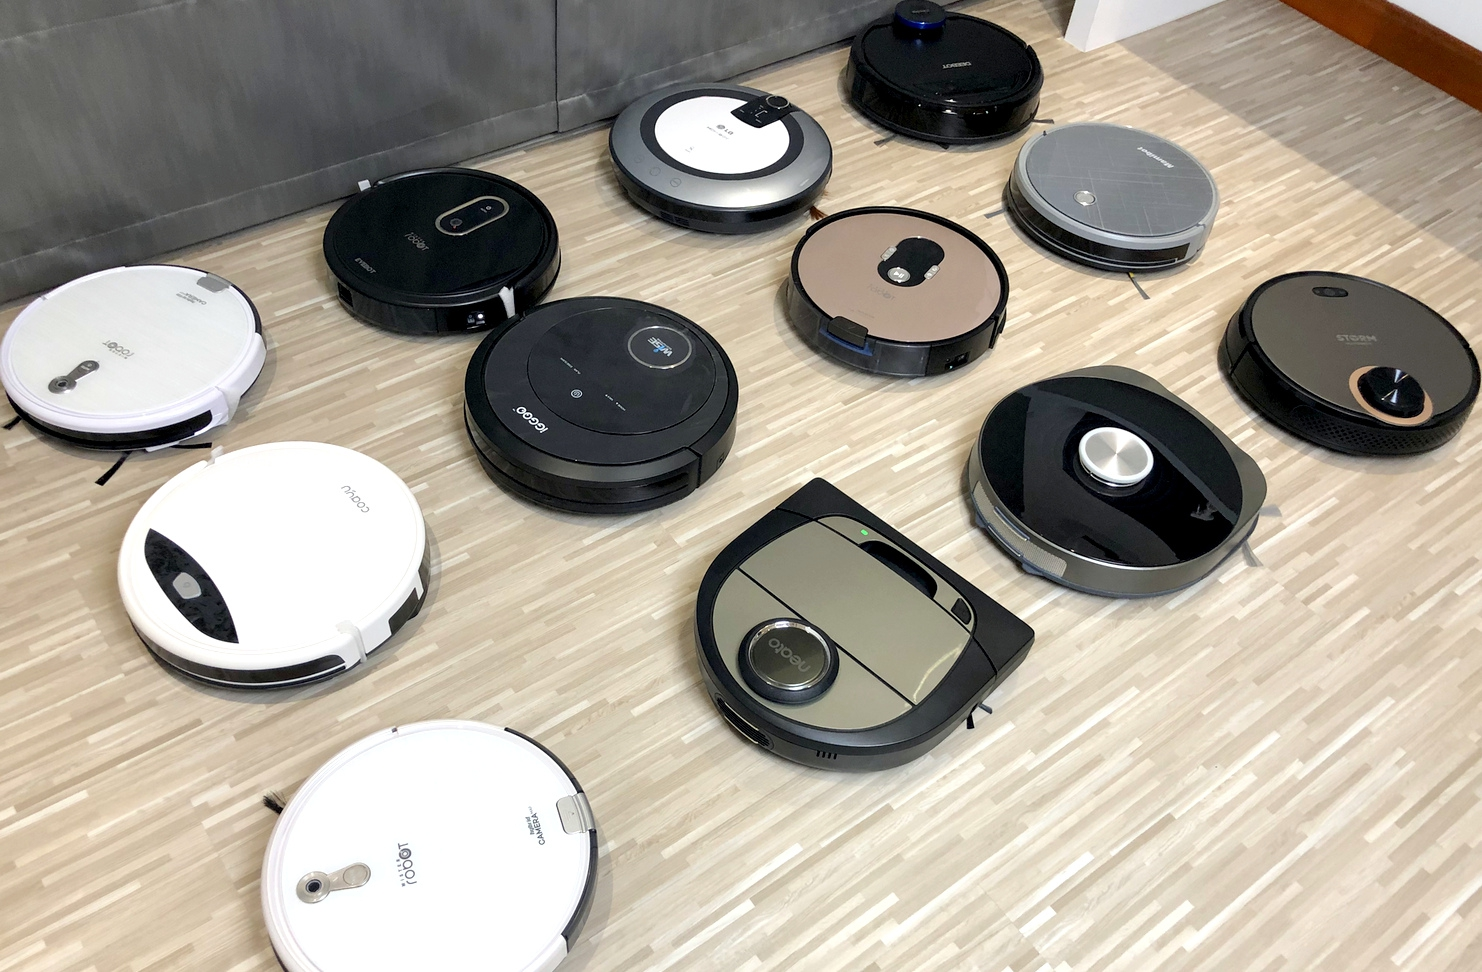 robot-vacuum-cleaner-featured-image-wordpress